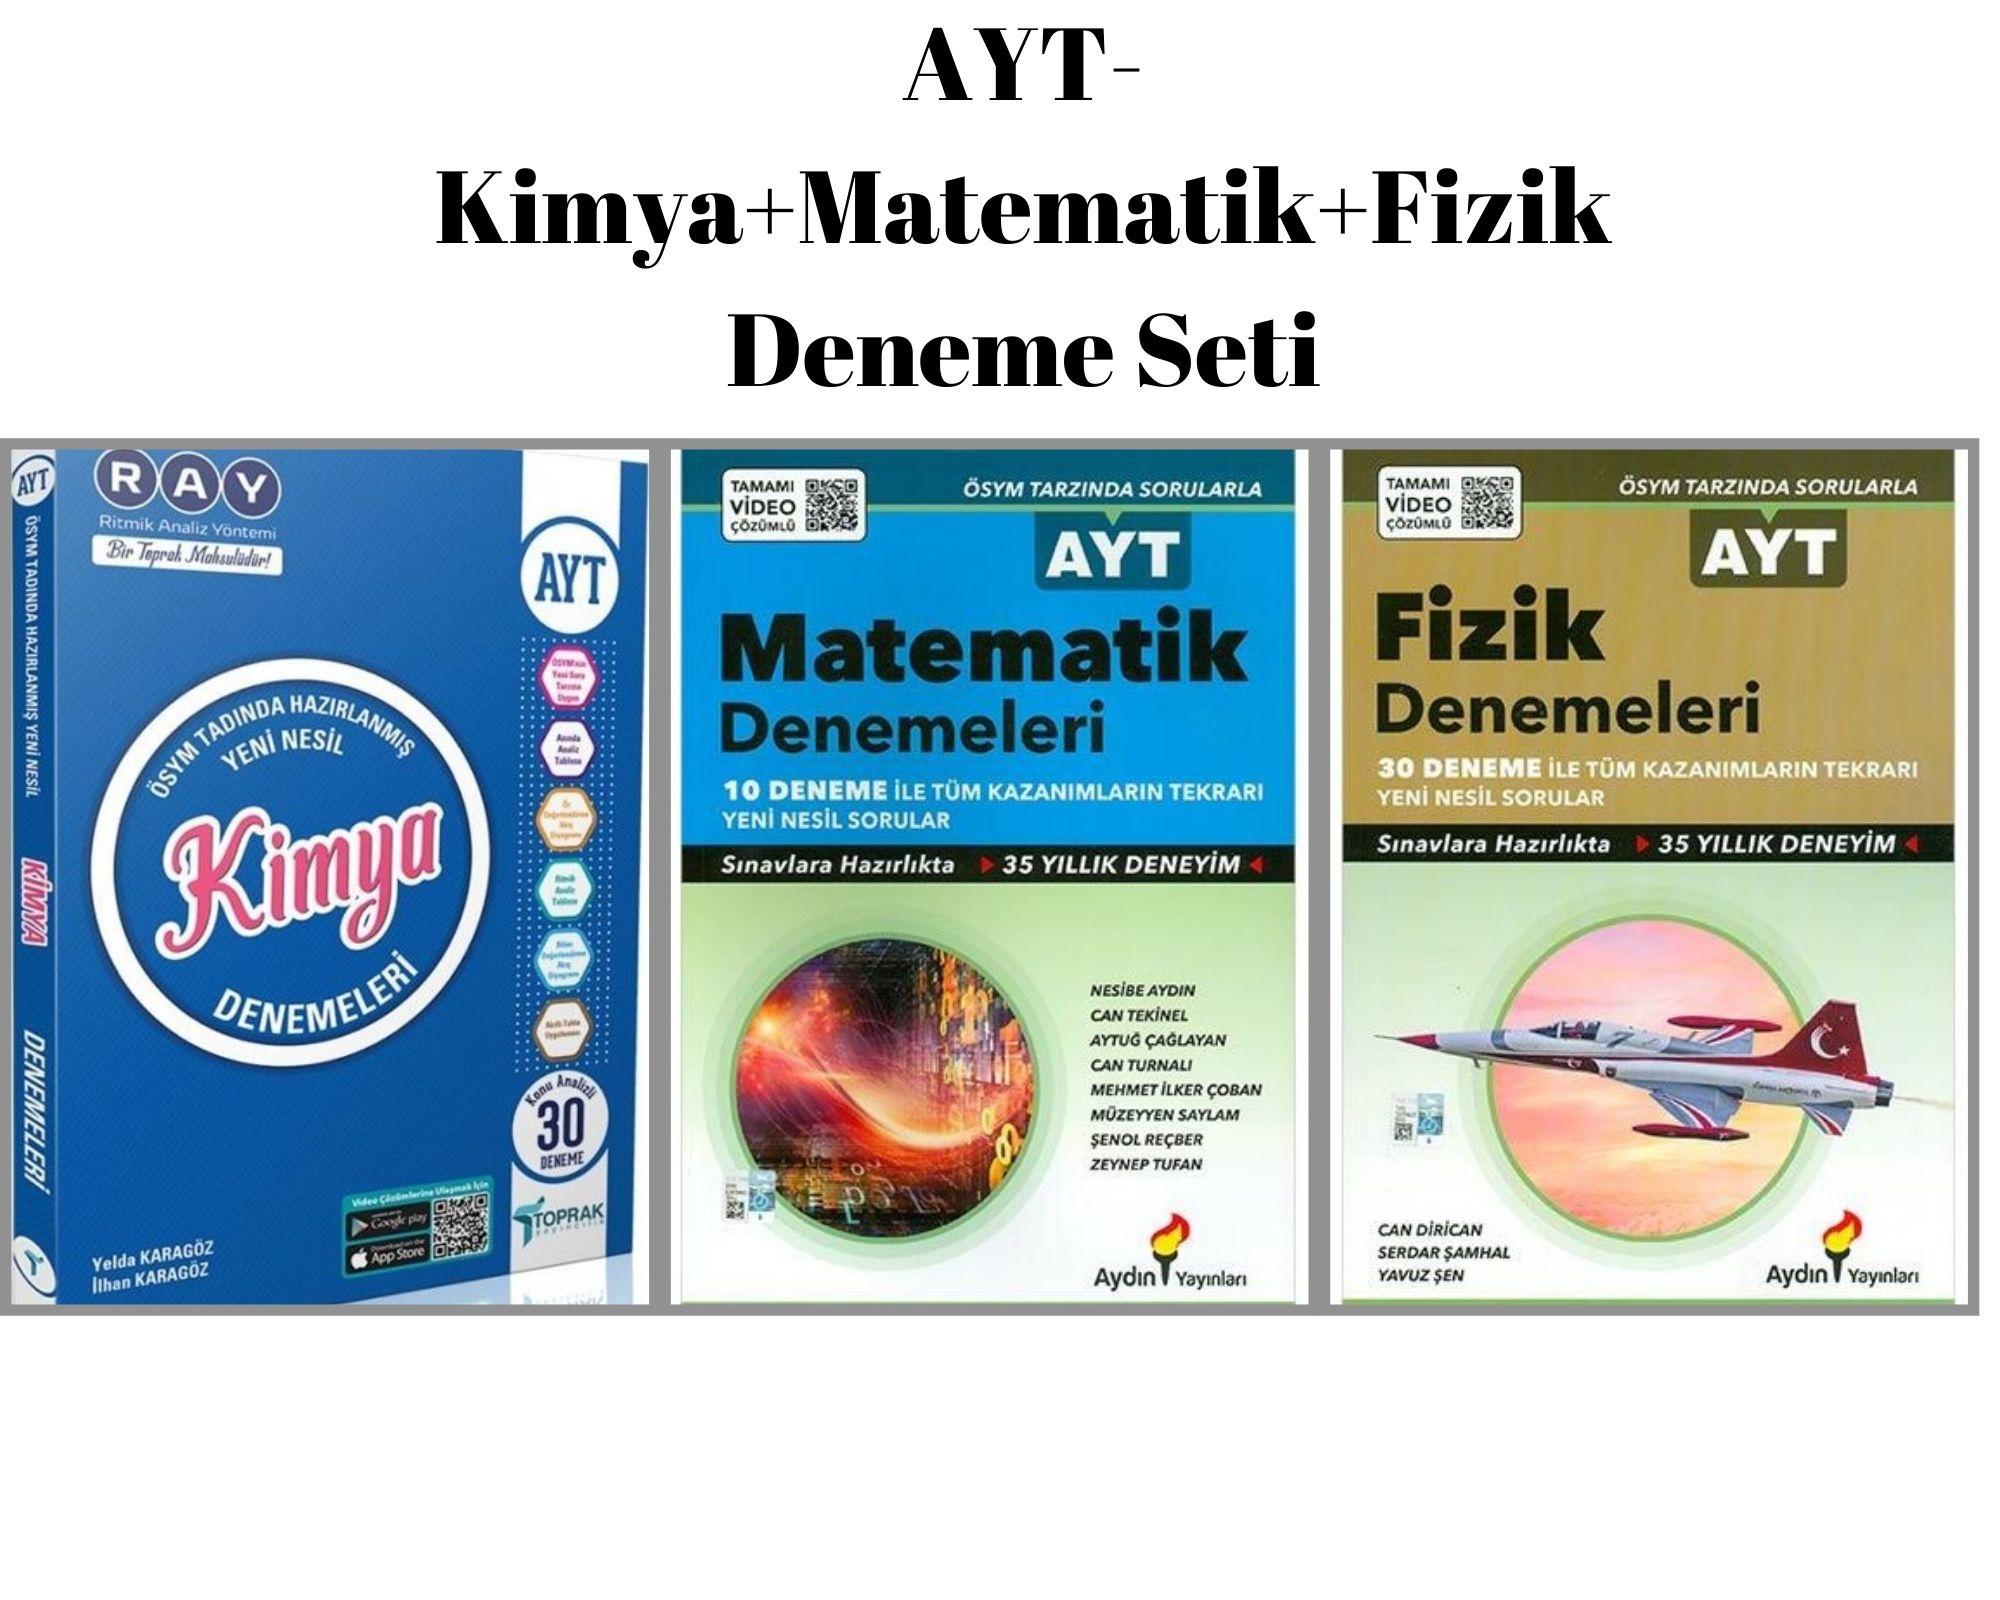 AYT-Kimya+Matematik+Fizik Deneme Seti